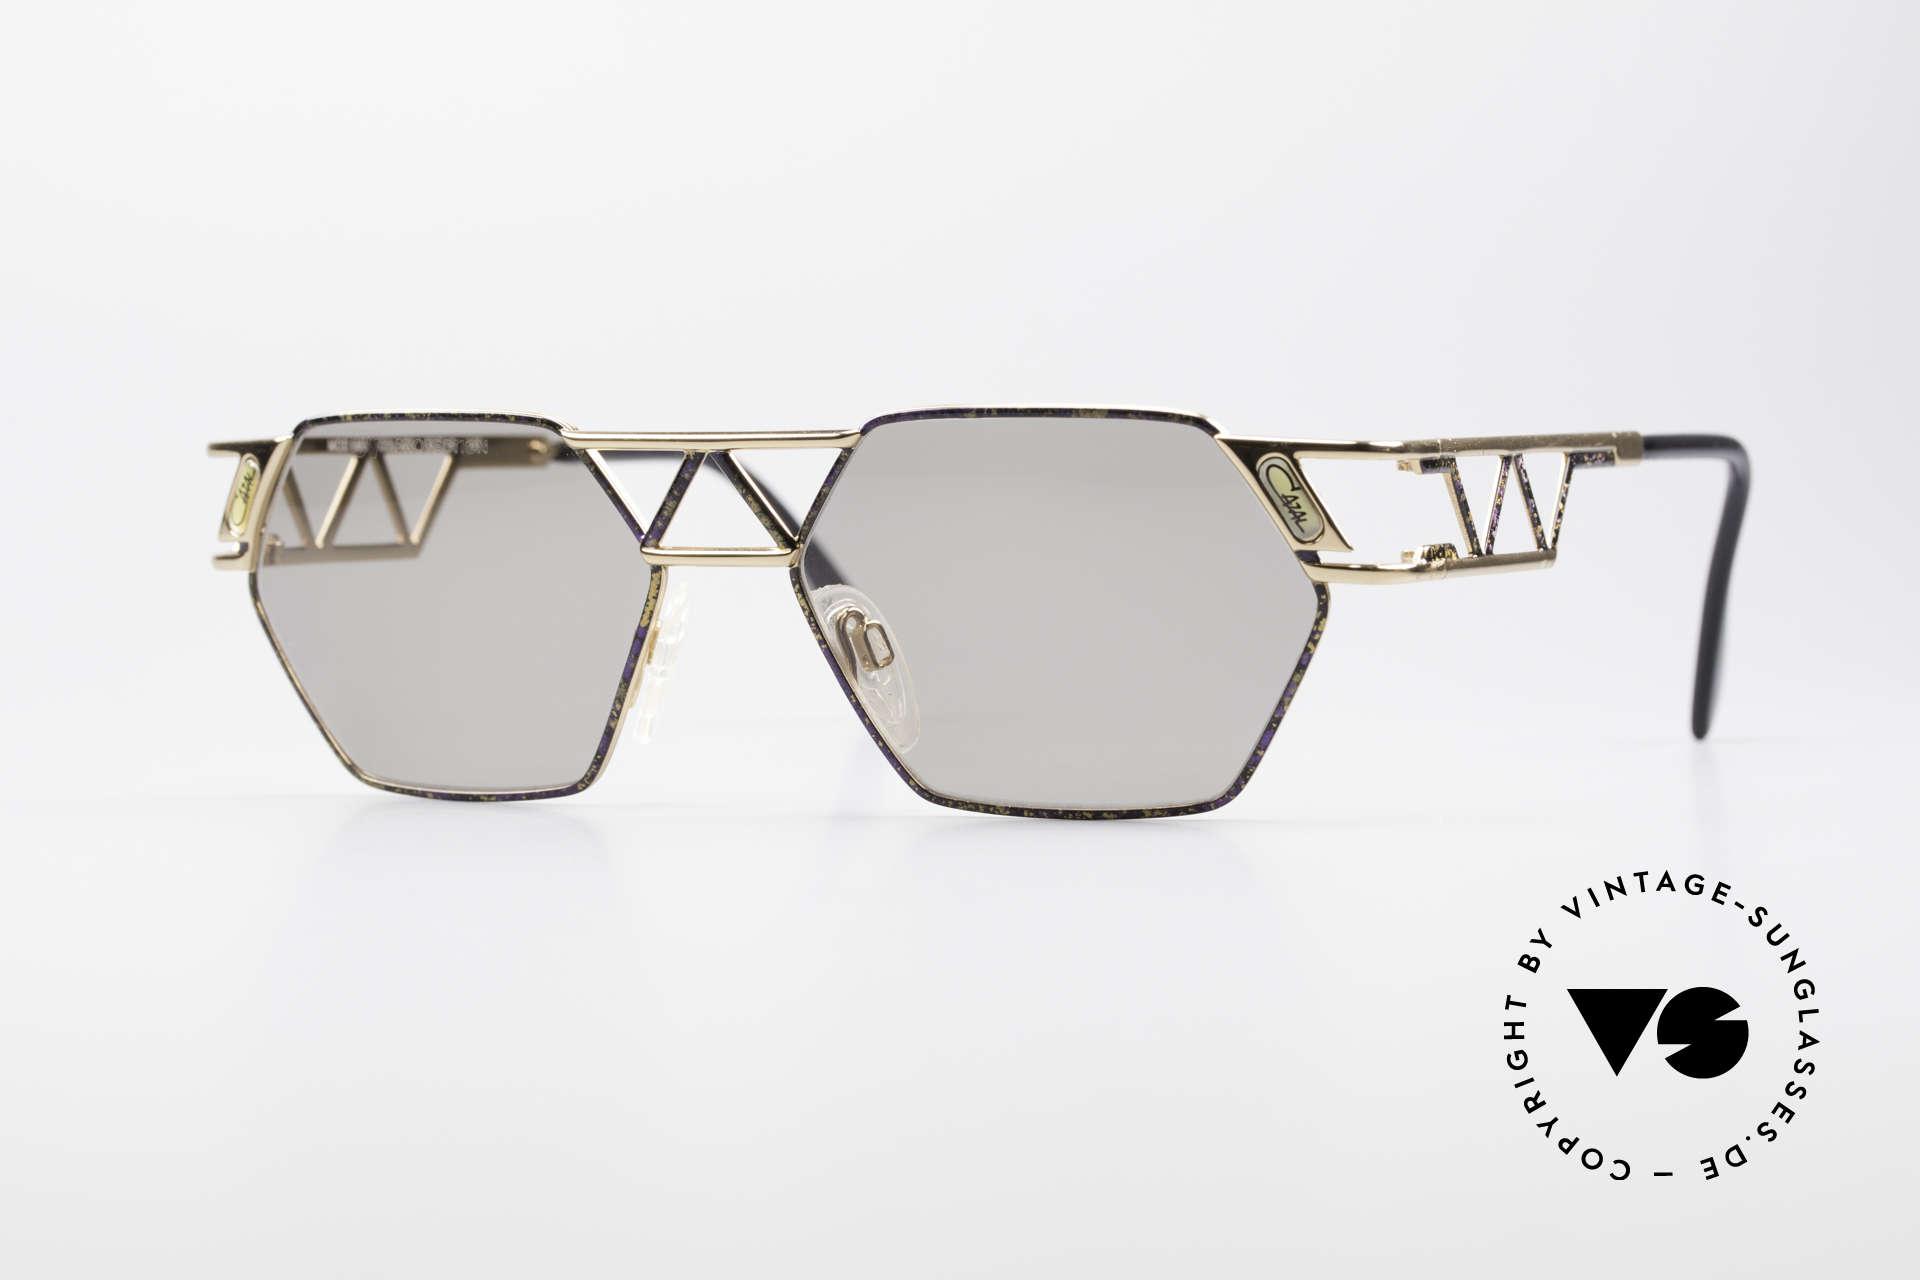 Cazal 960 Unique Designer Sunglasses, angular CAZAL designer sunglasses from app. 1994/95, Made for Men and Women